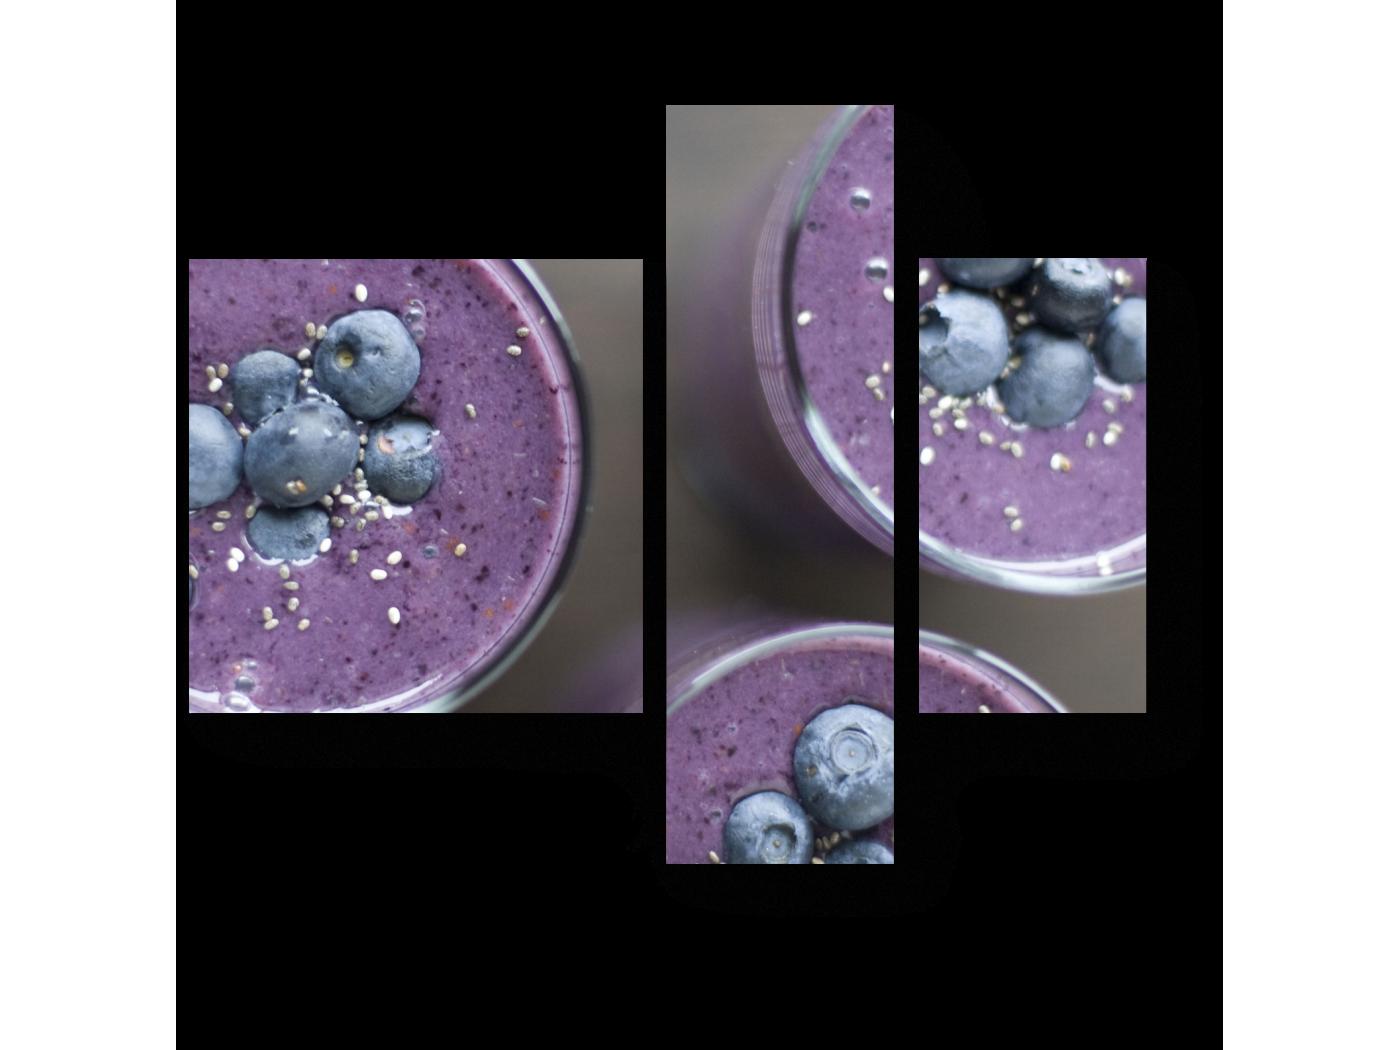 Модульная картина Смузи из голубики (80x66) фото